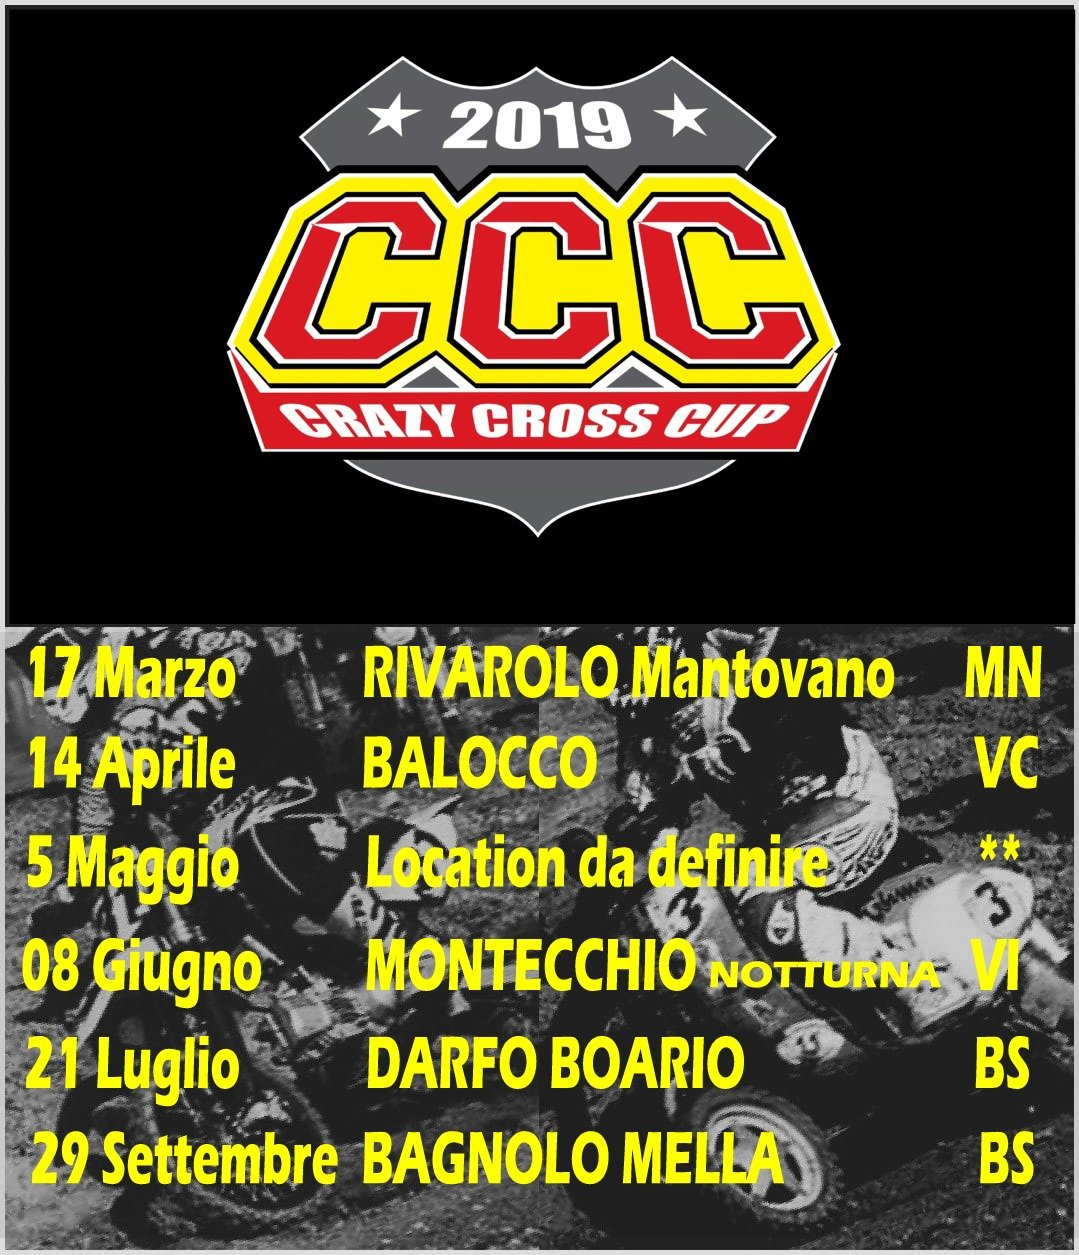 Calendario Vespa 2020.Calendario Italiano Endurance Cross 2019 Gare In Pista